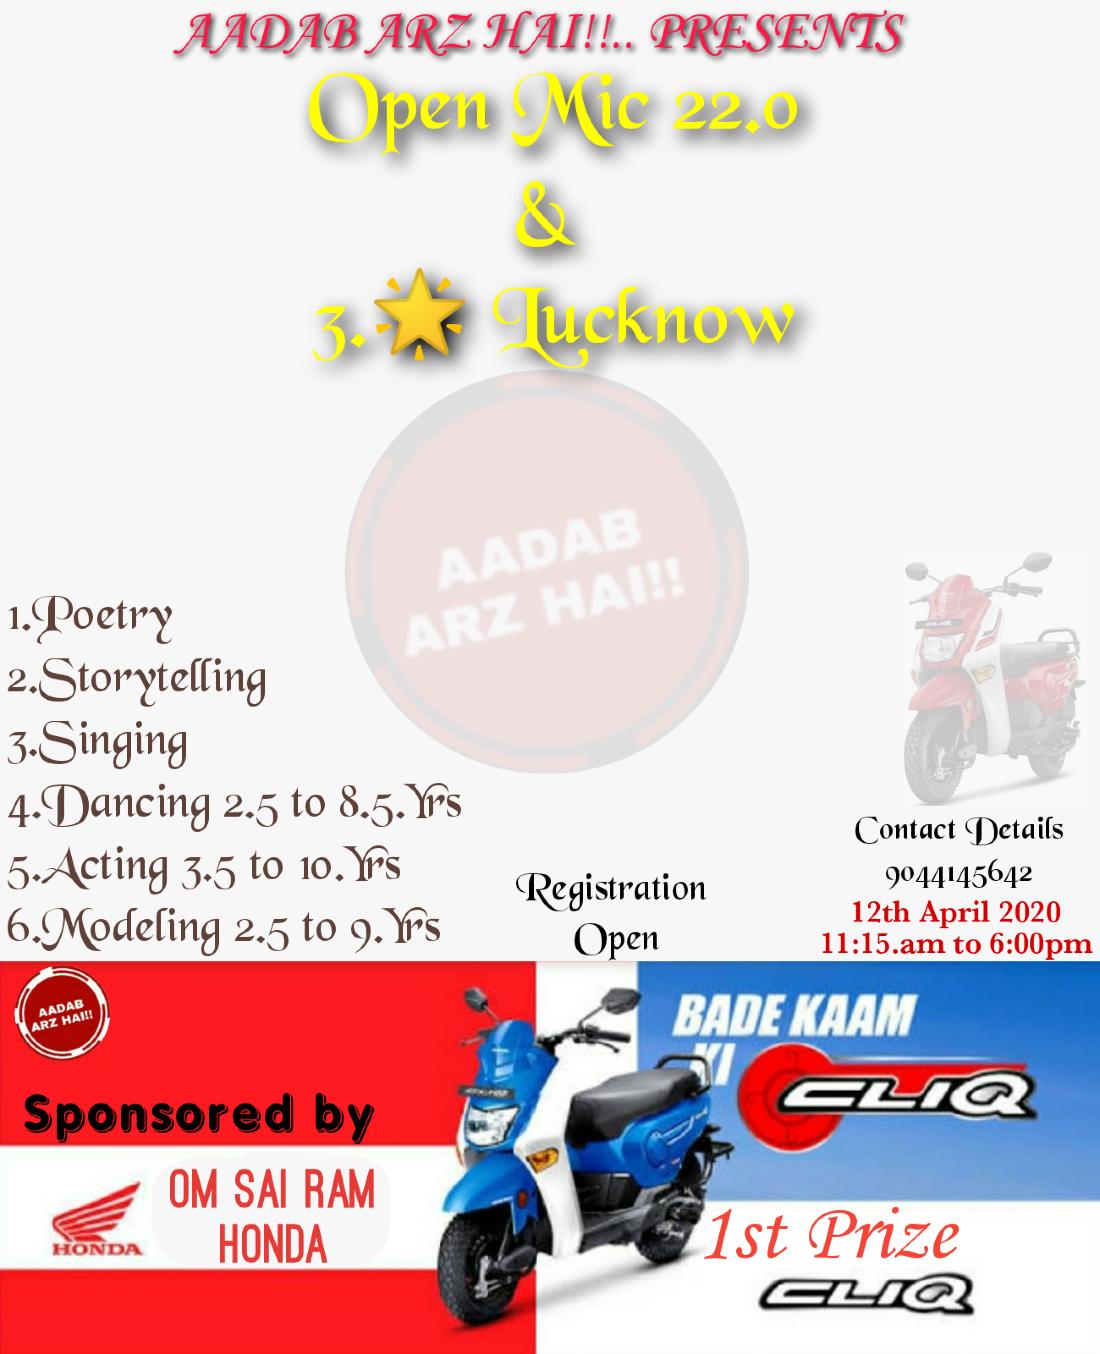 Aadab Arz Hai Talent Hunt 22.0 3 Star Lucknow